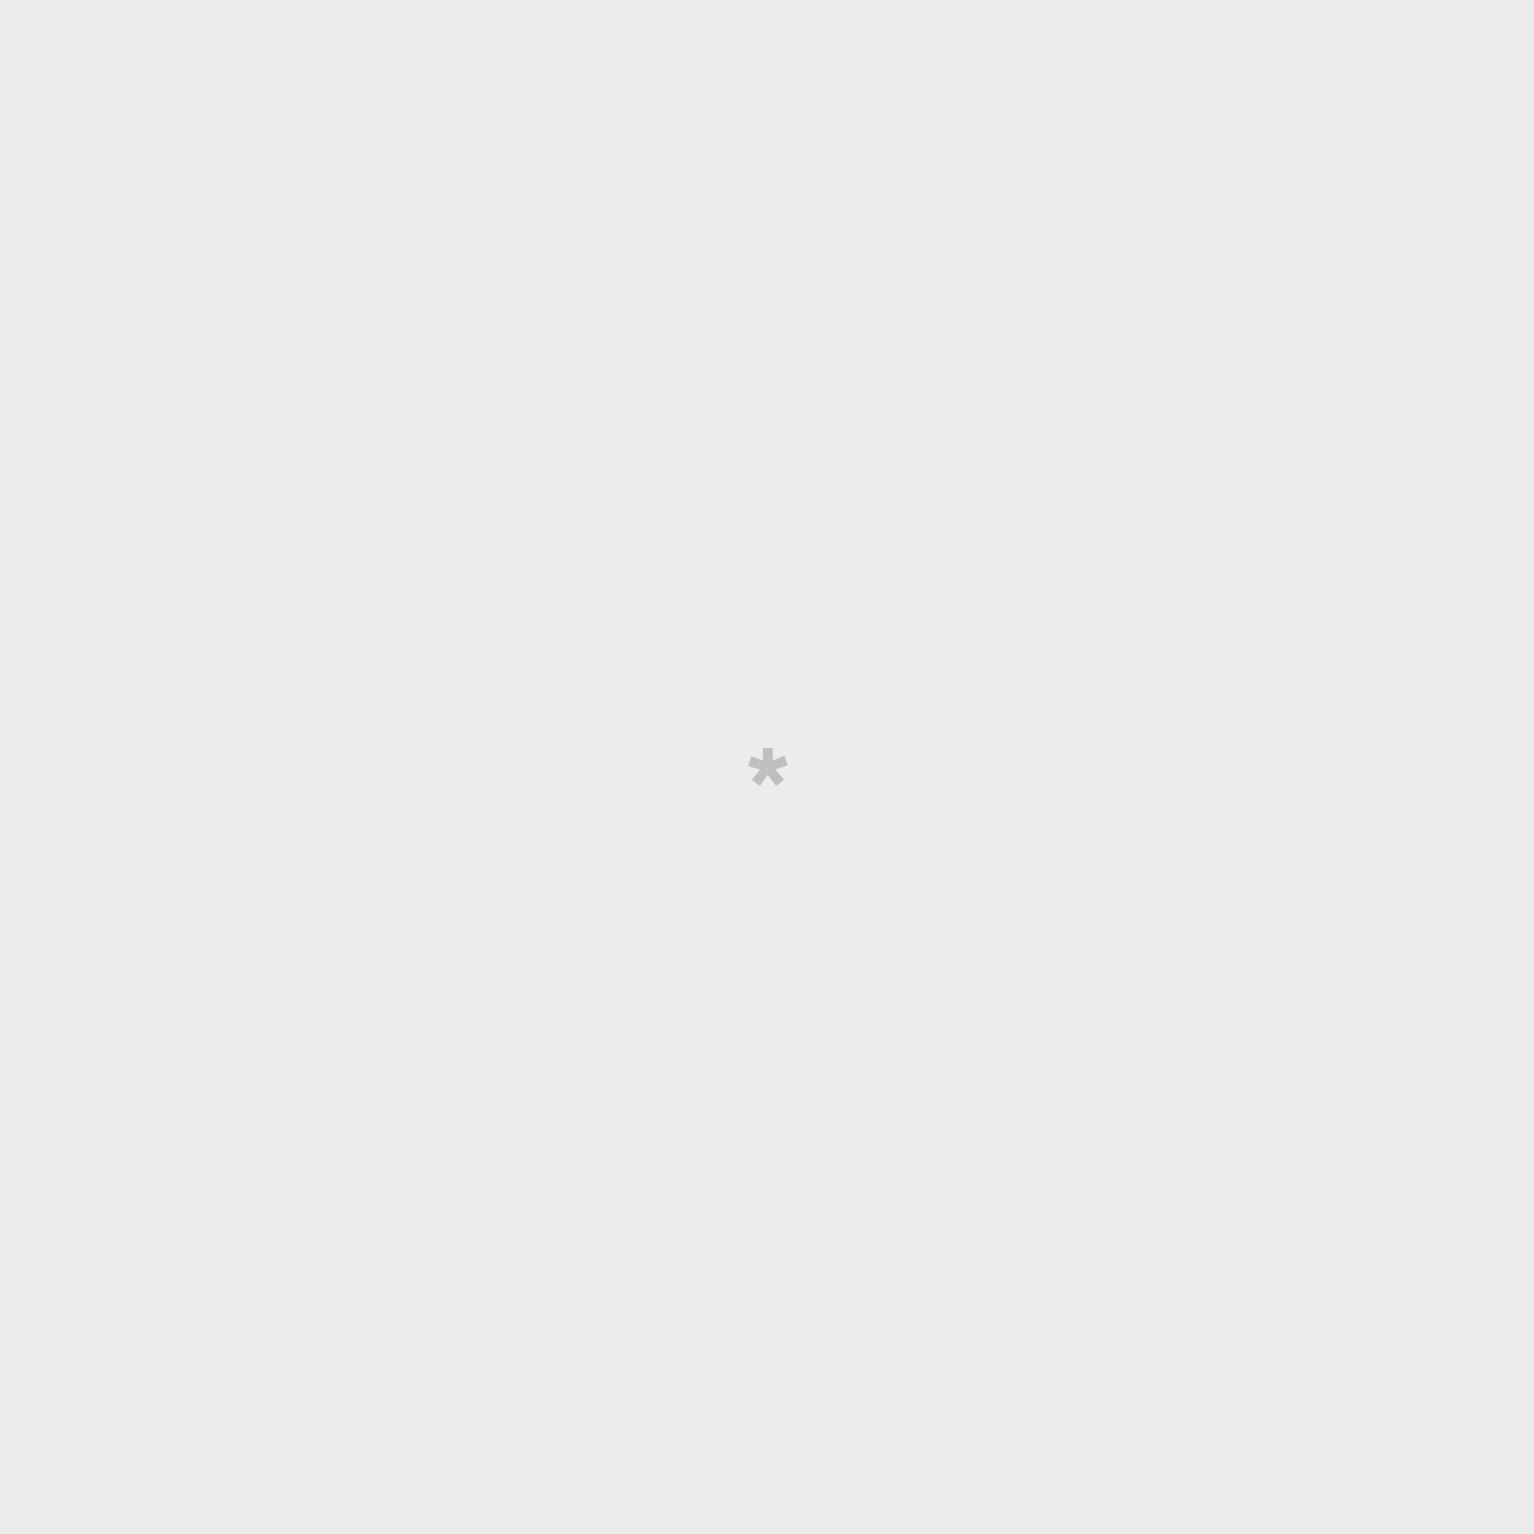 32 GB USB stick – Coffee